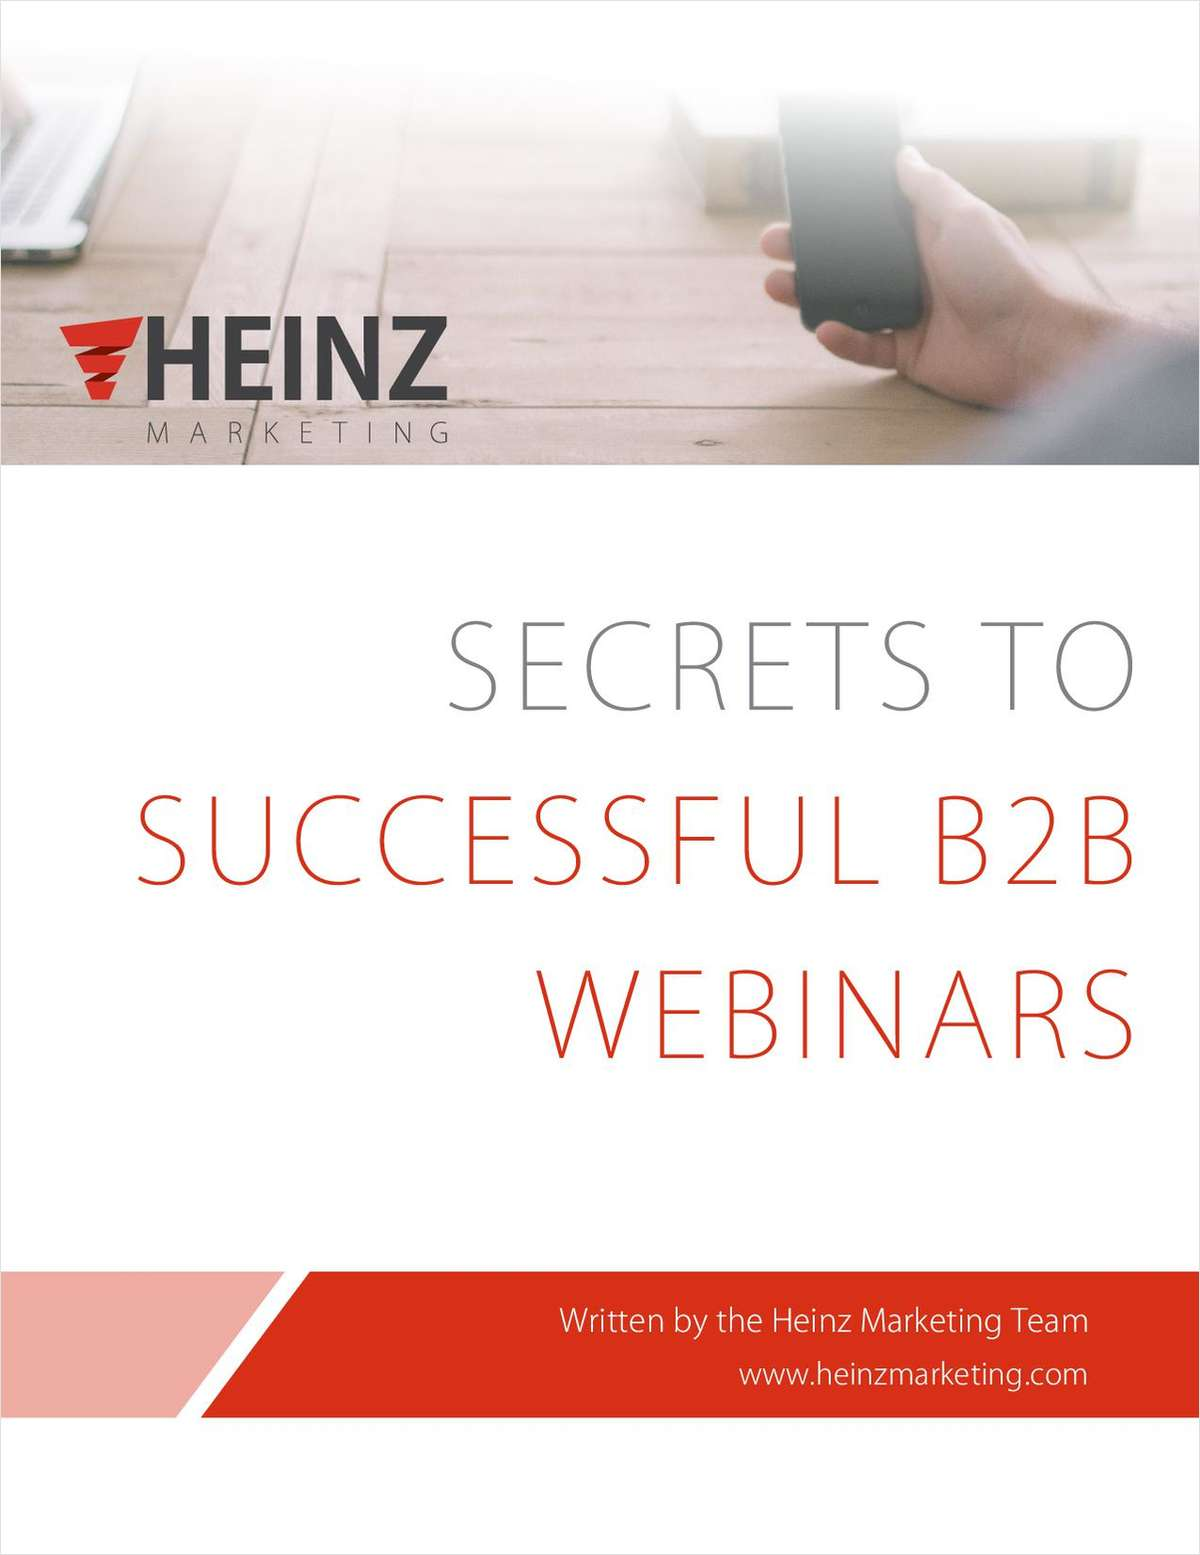 Secrets to Successful B2B Webinars